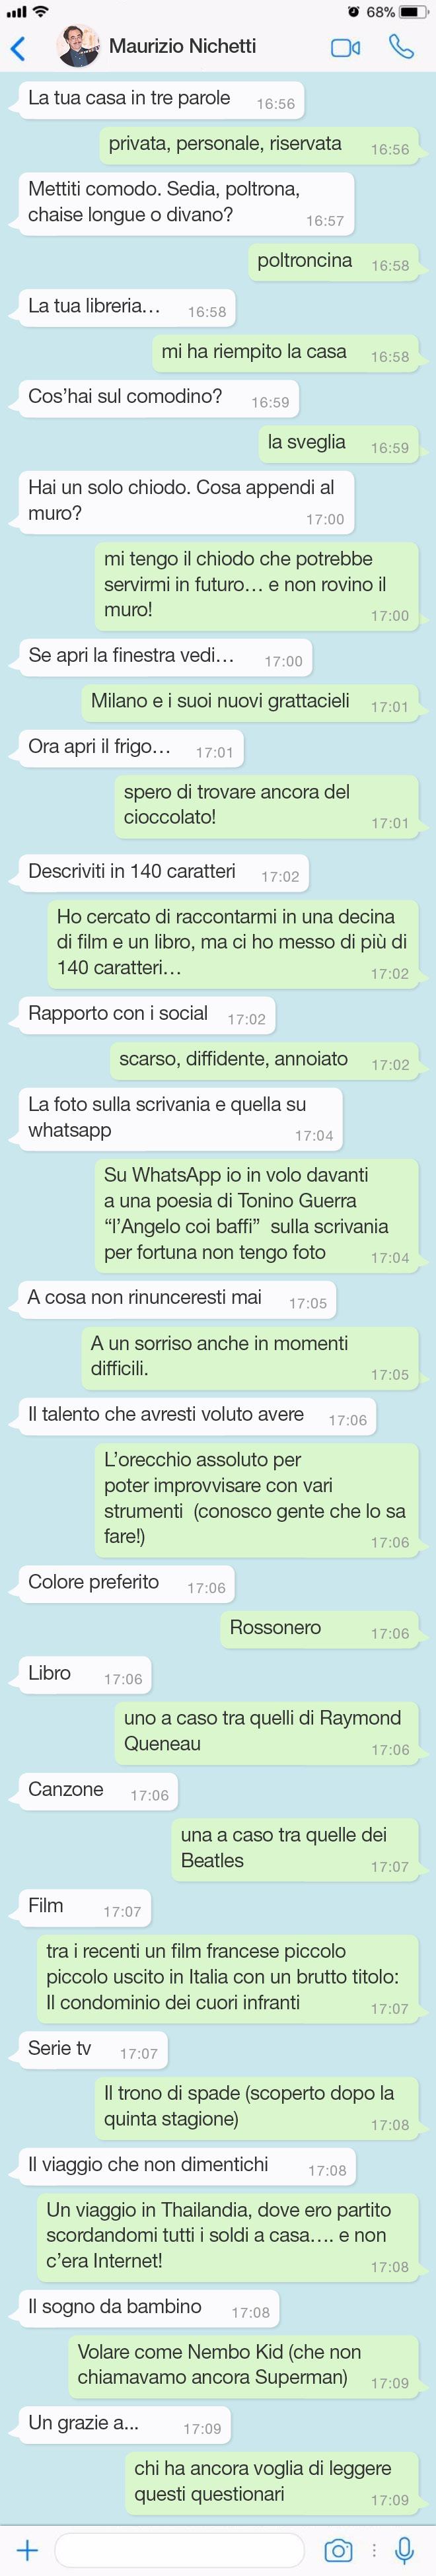 whatsapp-nichetti-ok